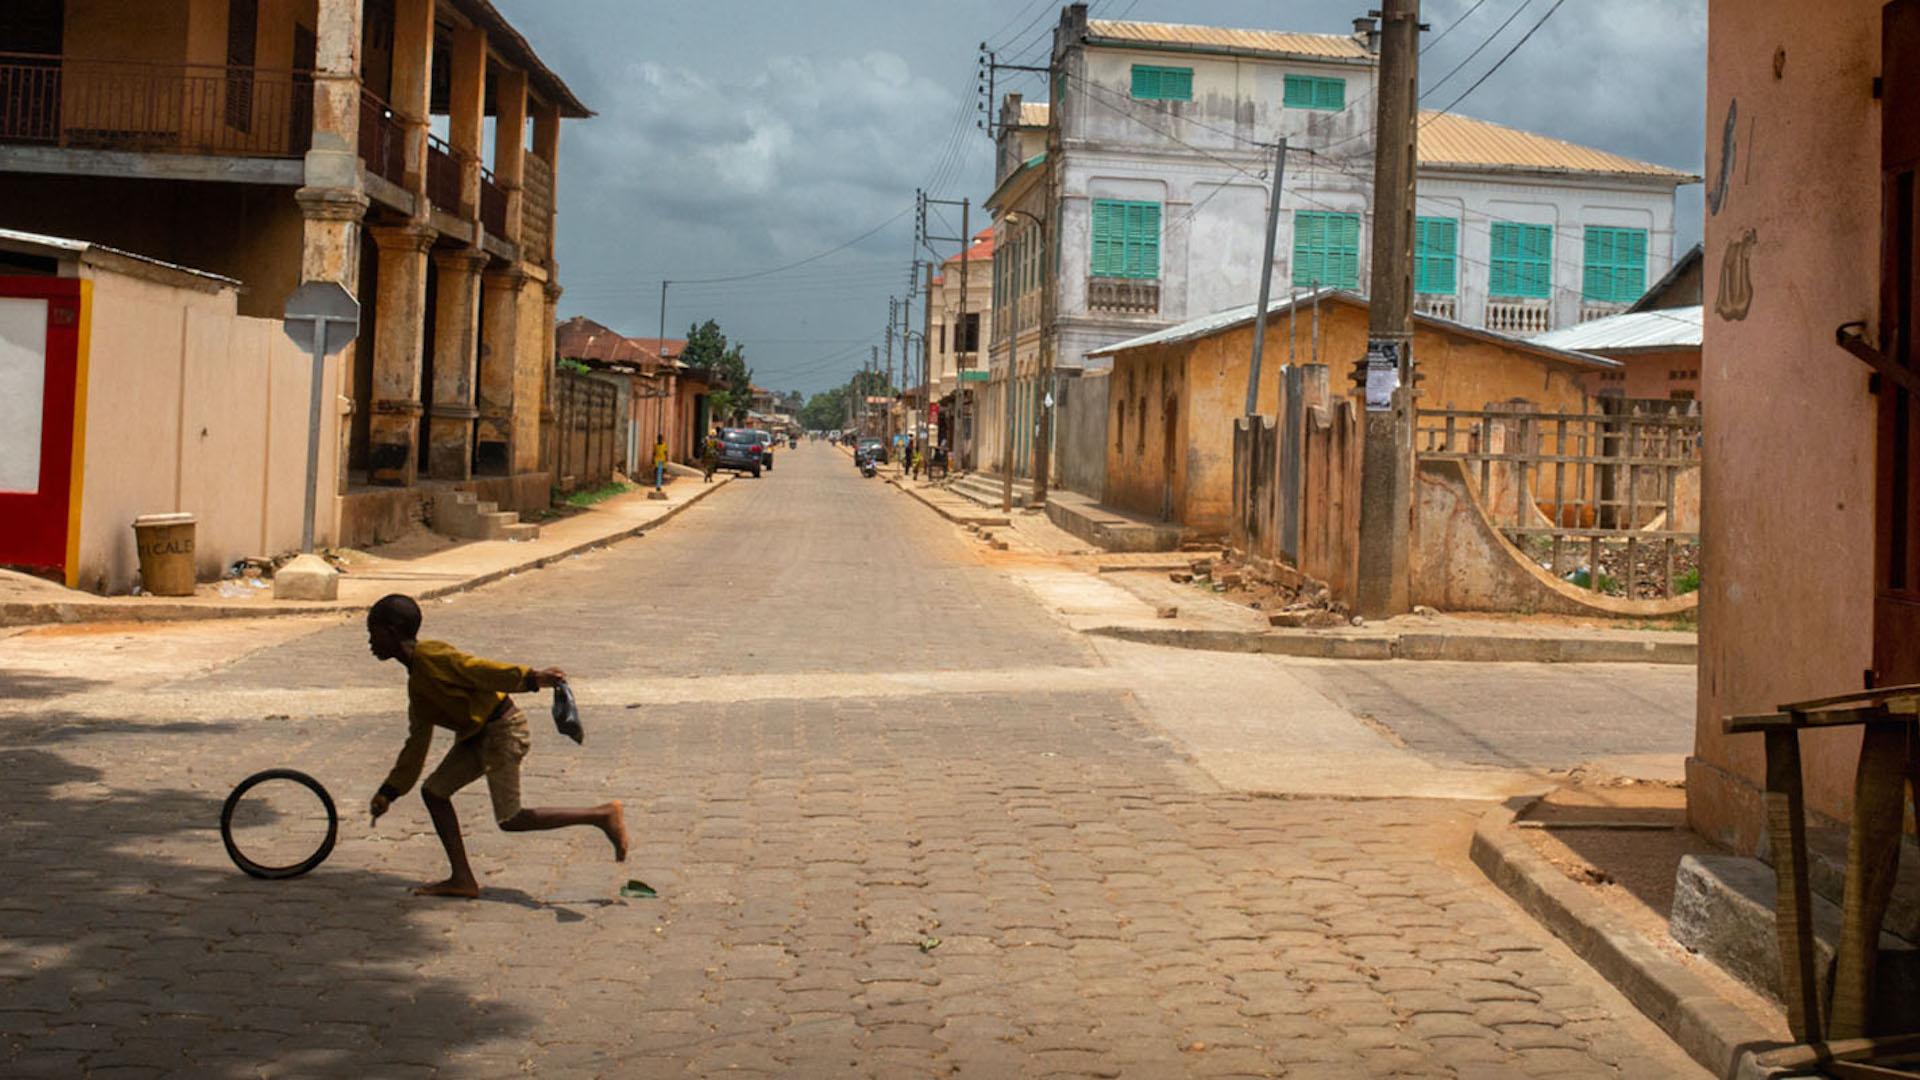 Fujifilm Moment Street Photo Awards 2021